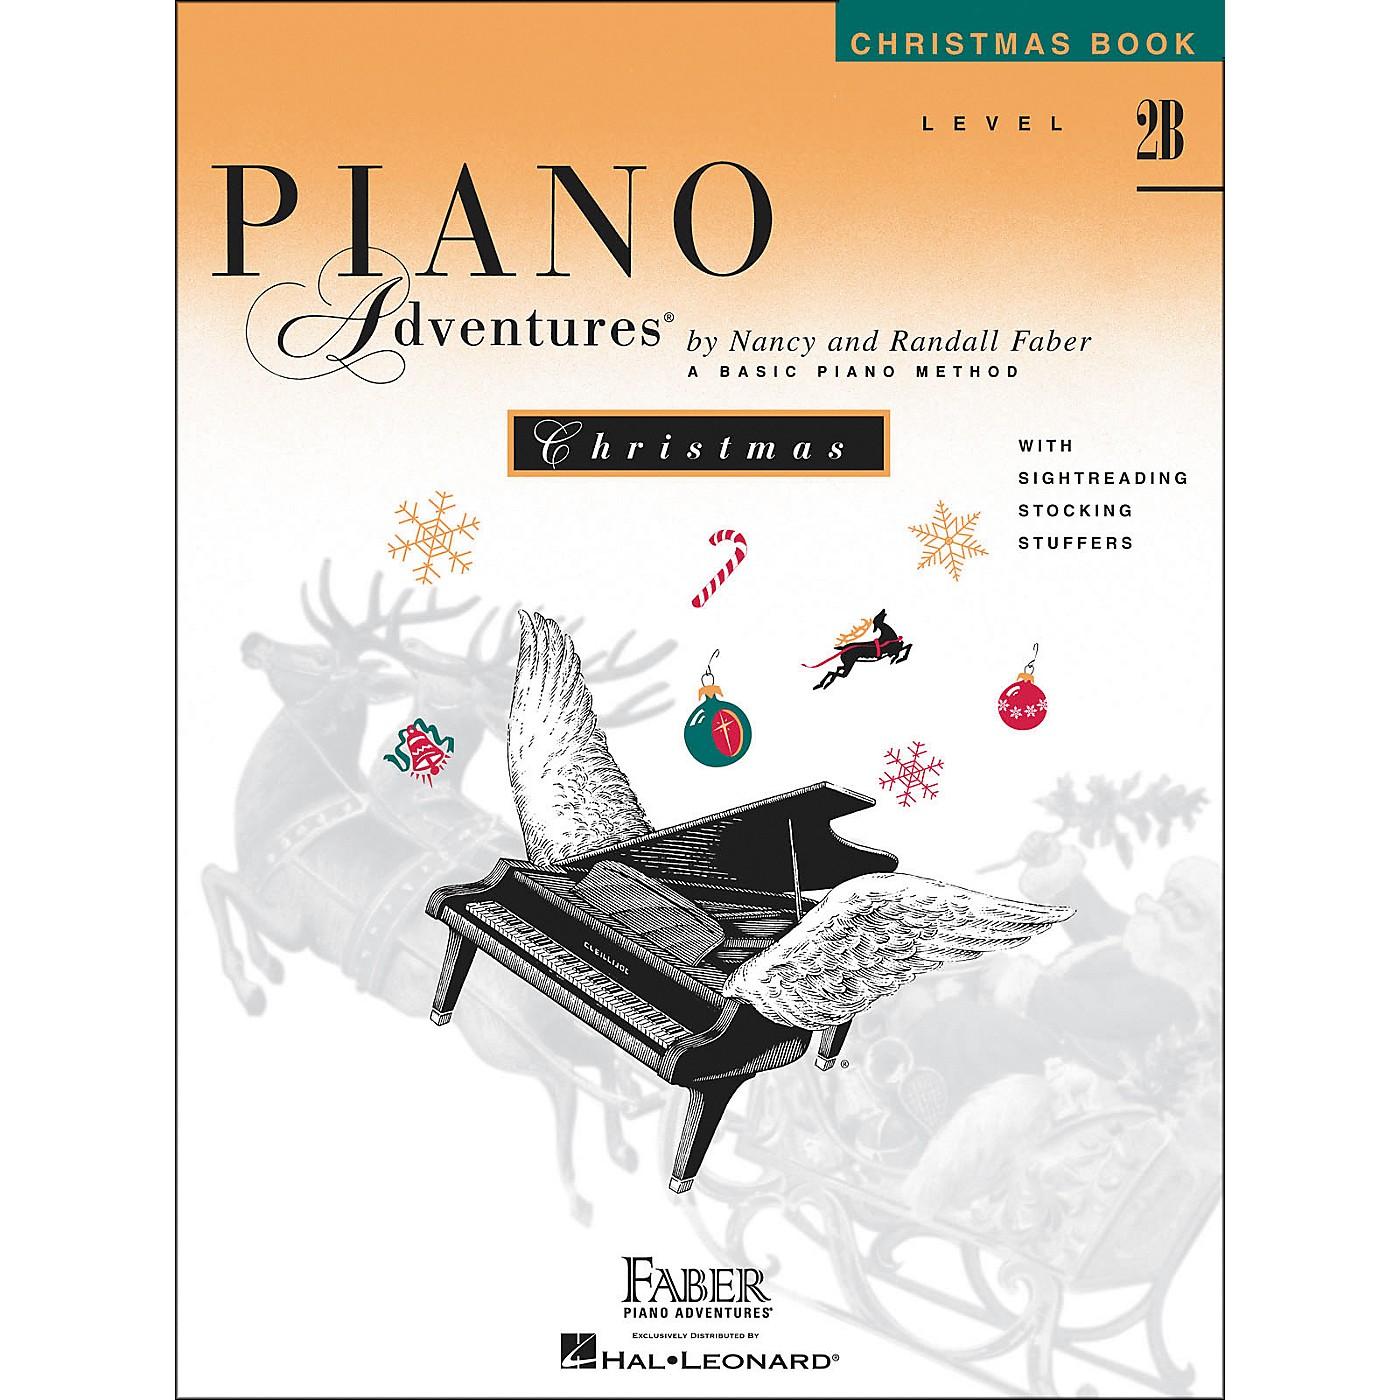 Faber Piano Adventures Piano Adventures Christmas Level 2B - Faber Piano thumbnail